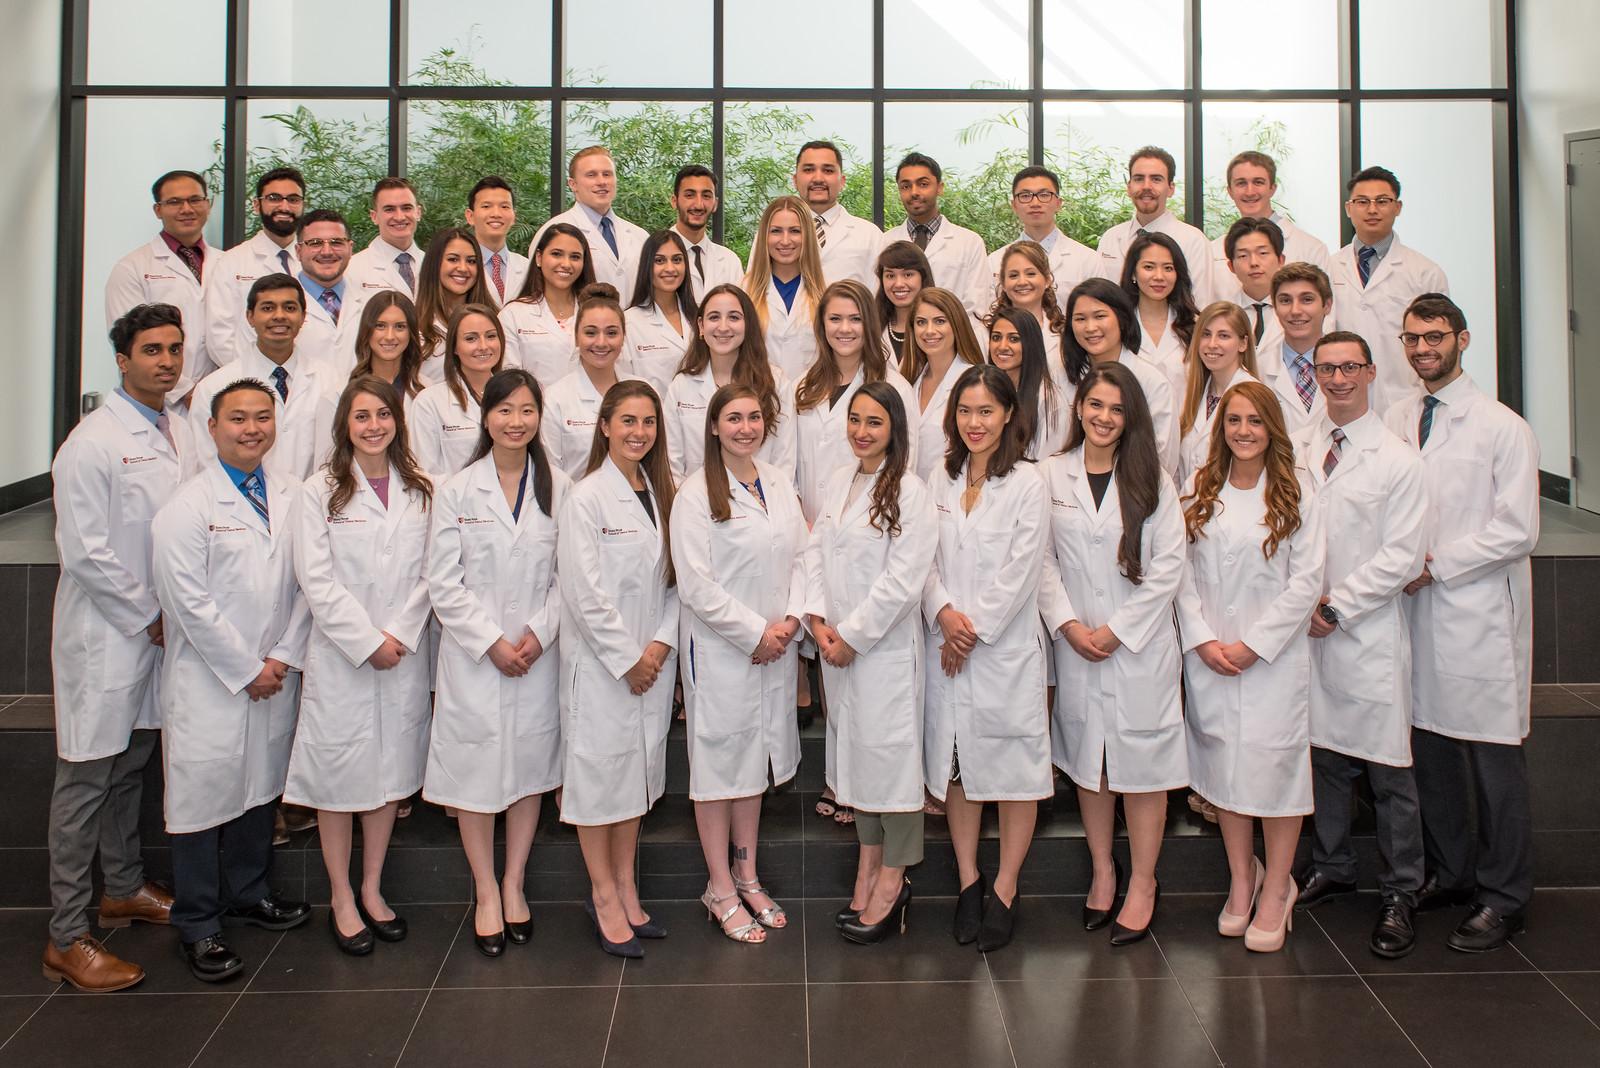 Photo of Stony Brook School of Dental Medicine's Class of 2021